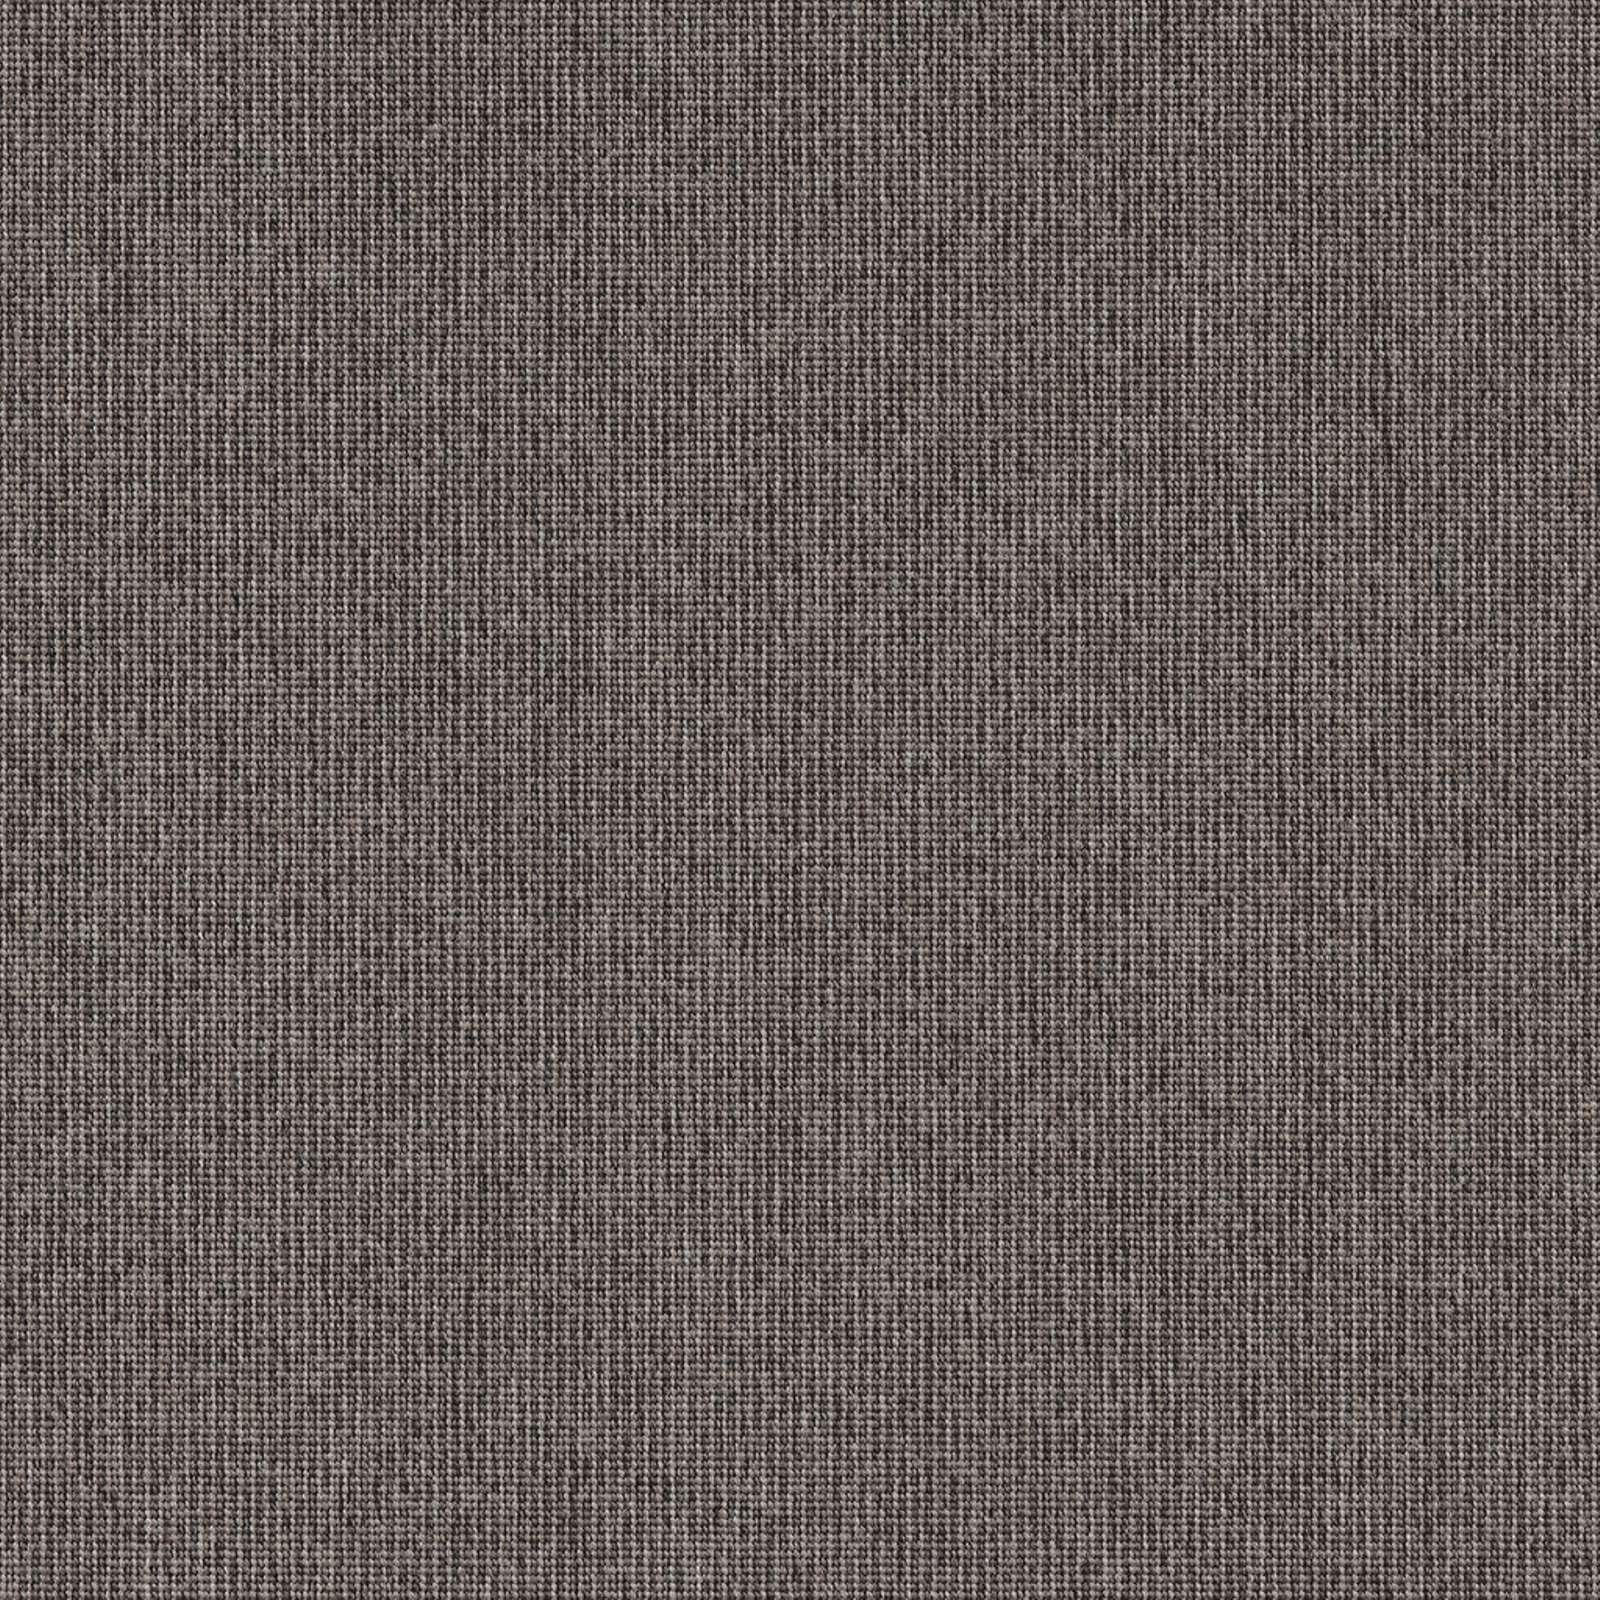 Плитка ковровая Modulyss 817, 50*50, Opposite